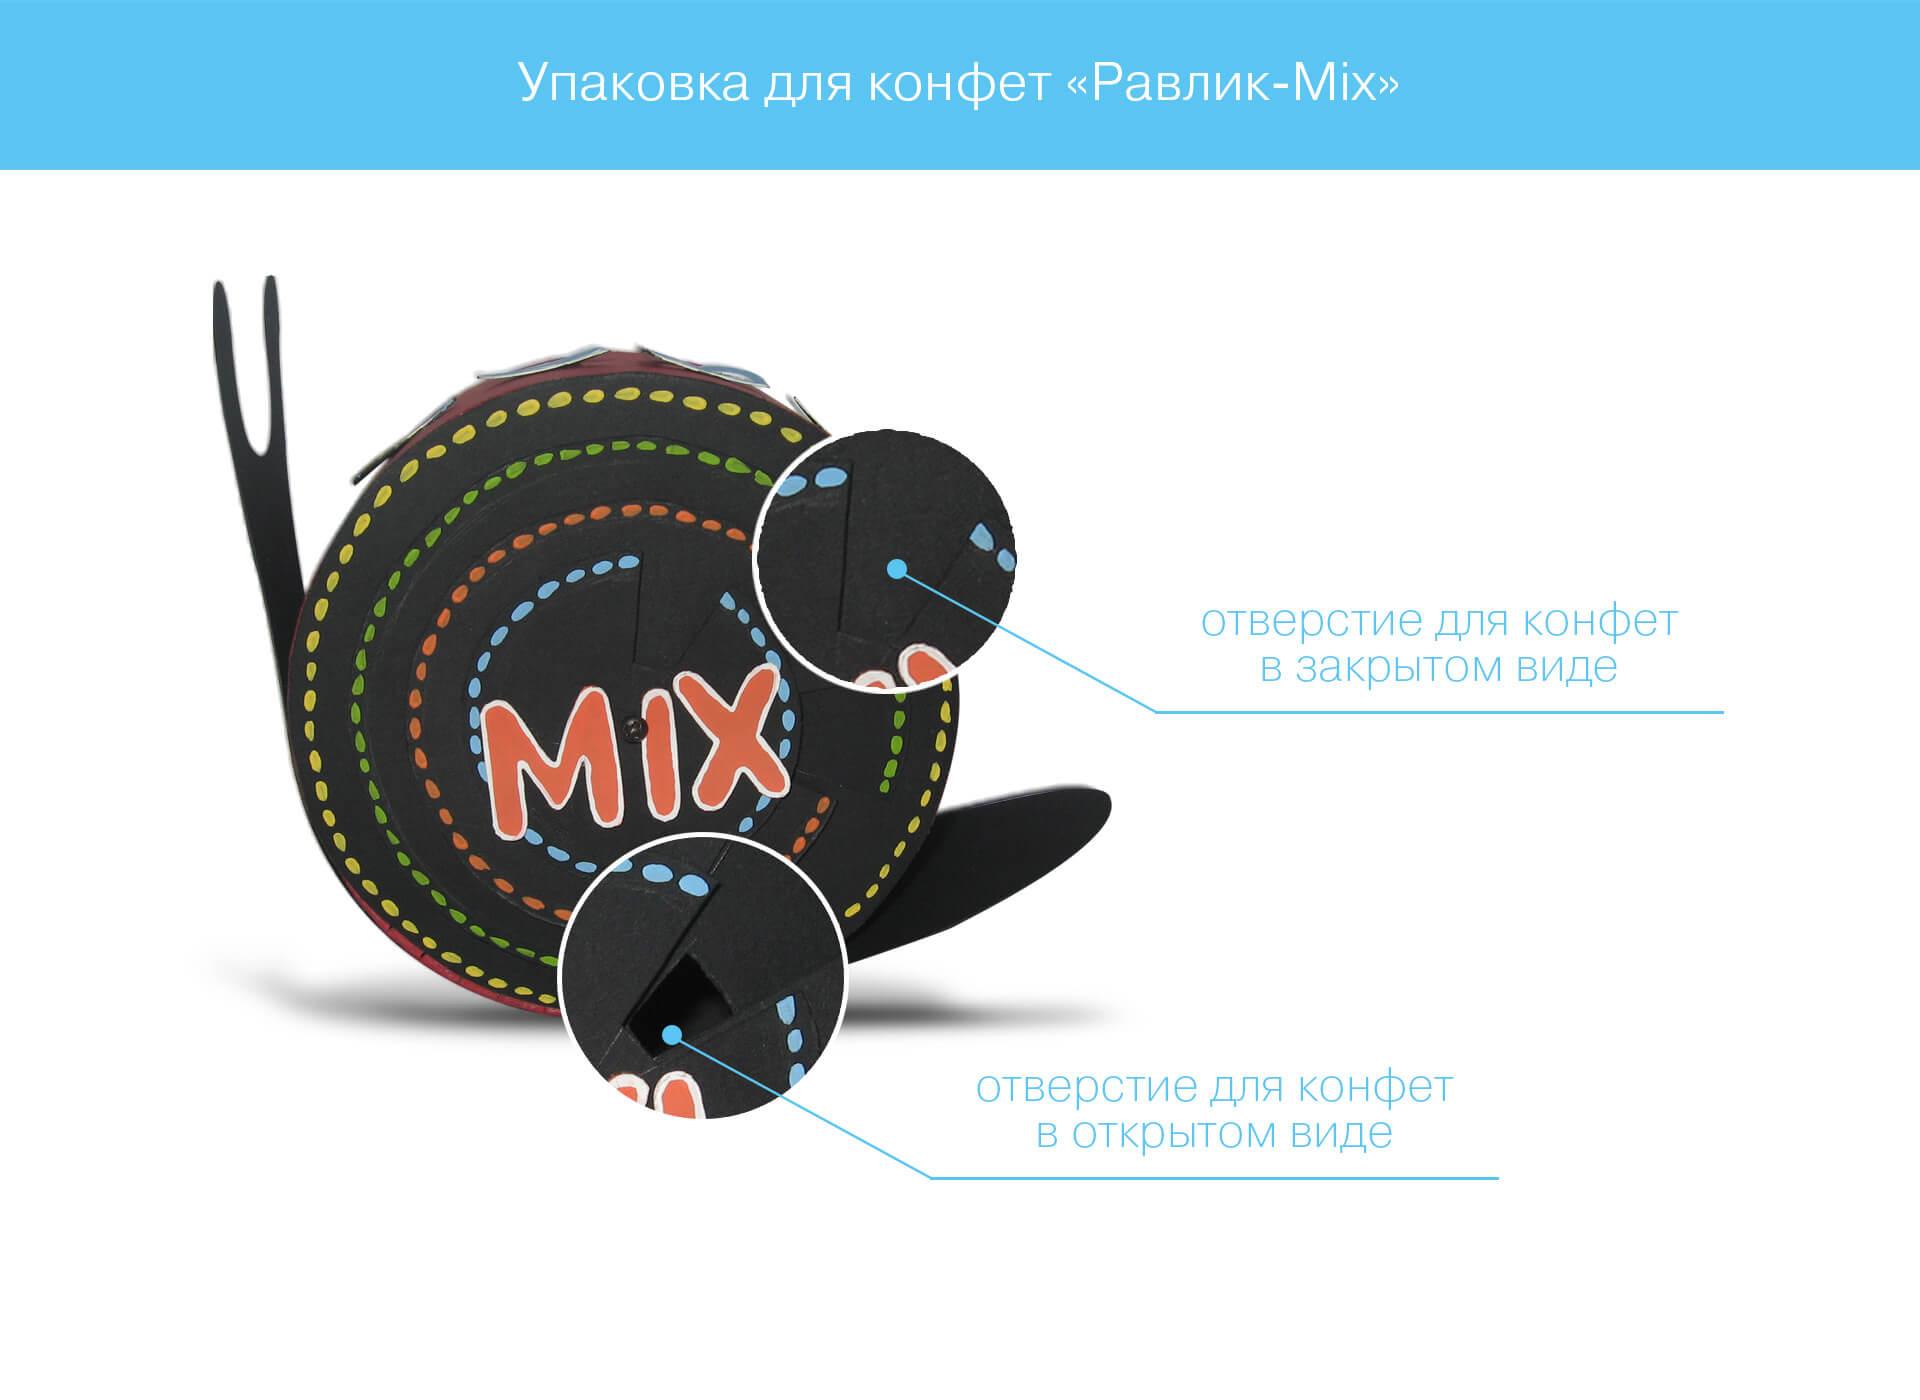 Prokochuk_Irina_packaging Ravlyk-Mix сandy_3